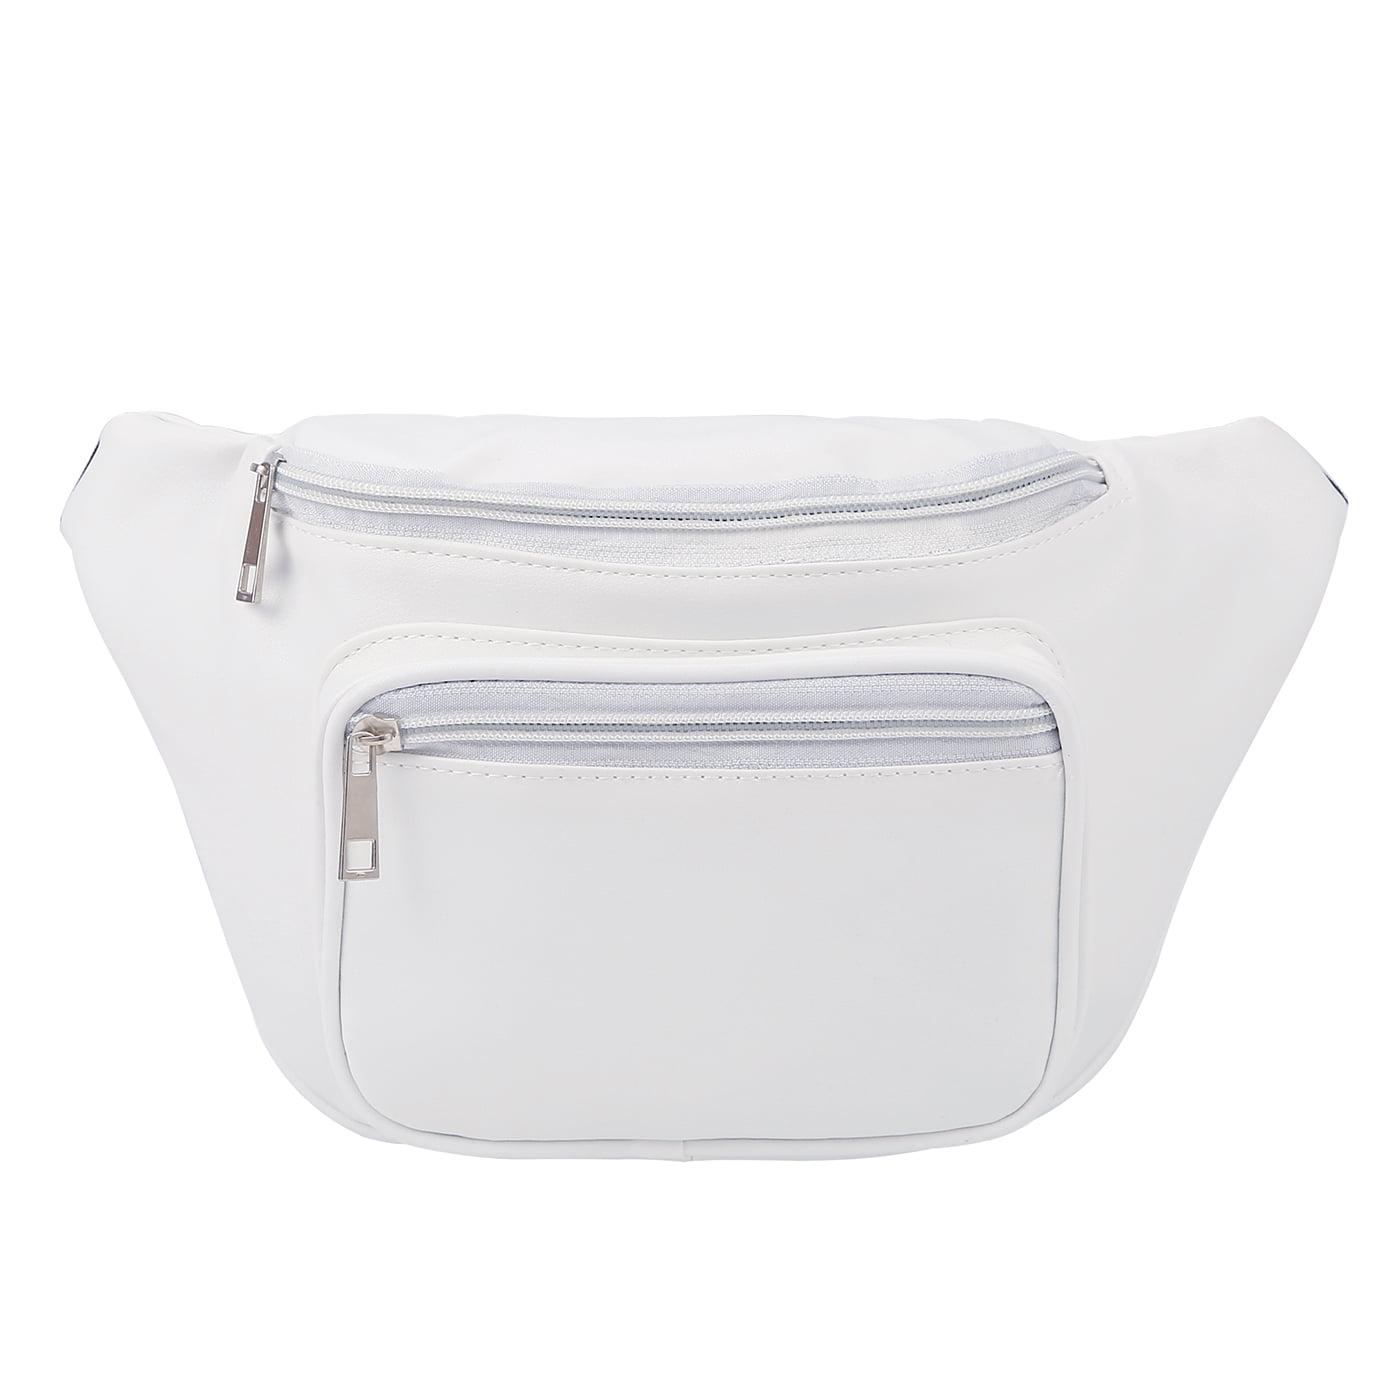 Travel Waist Pack,travel Pocket With Adjustable Belt Beauty Skulls Running Lumbar Pack For Travel Outdoor Sports Walking